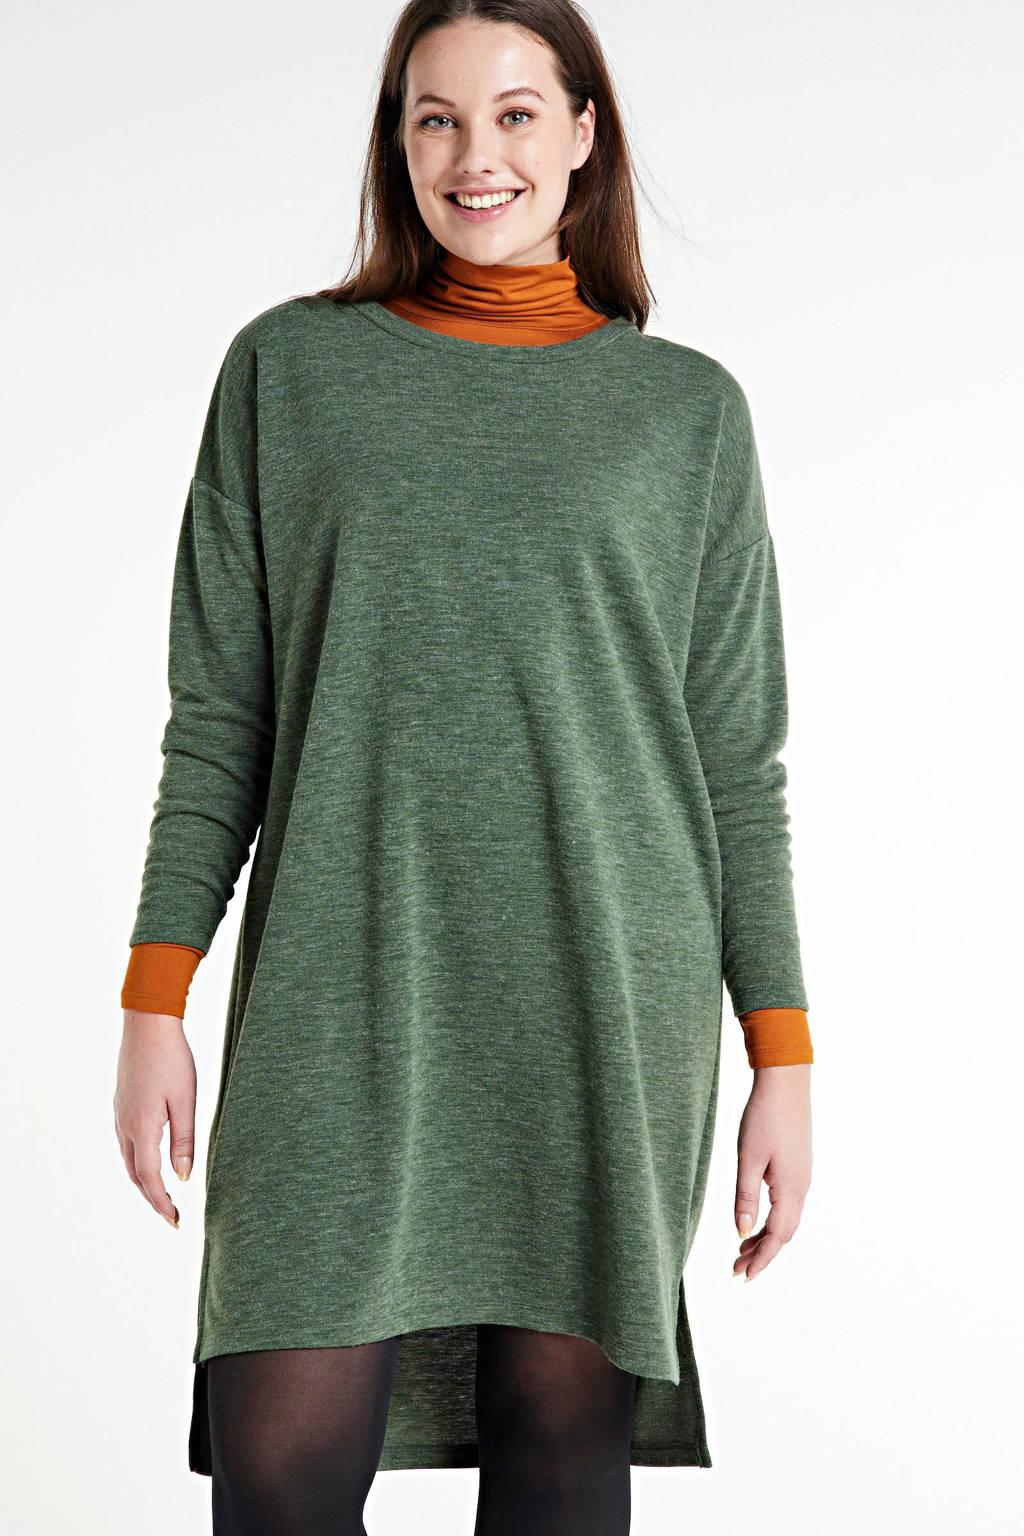 VERO MODA CURVE gemêleerde gebreide jurk Amaimarco groen, Groen